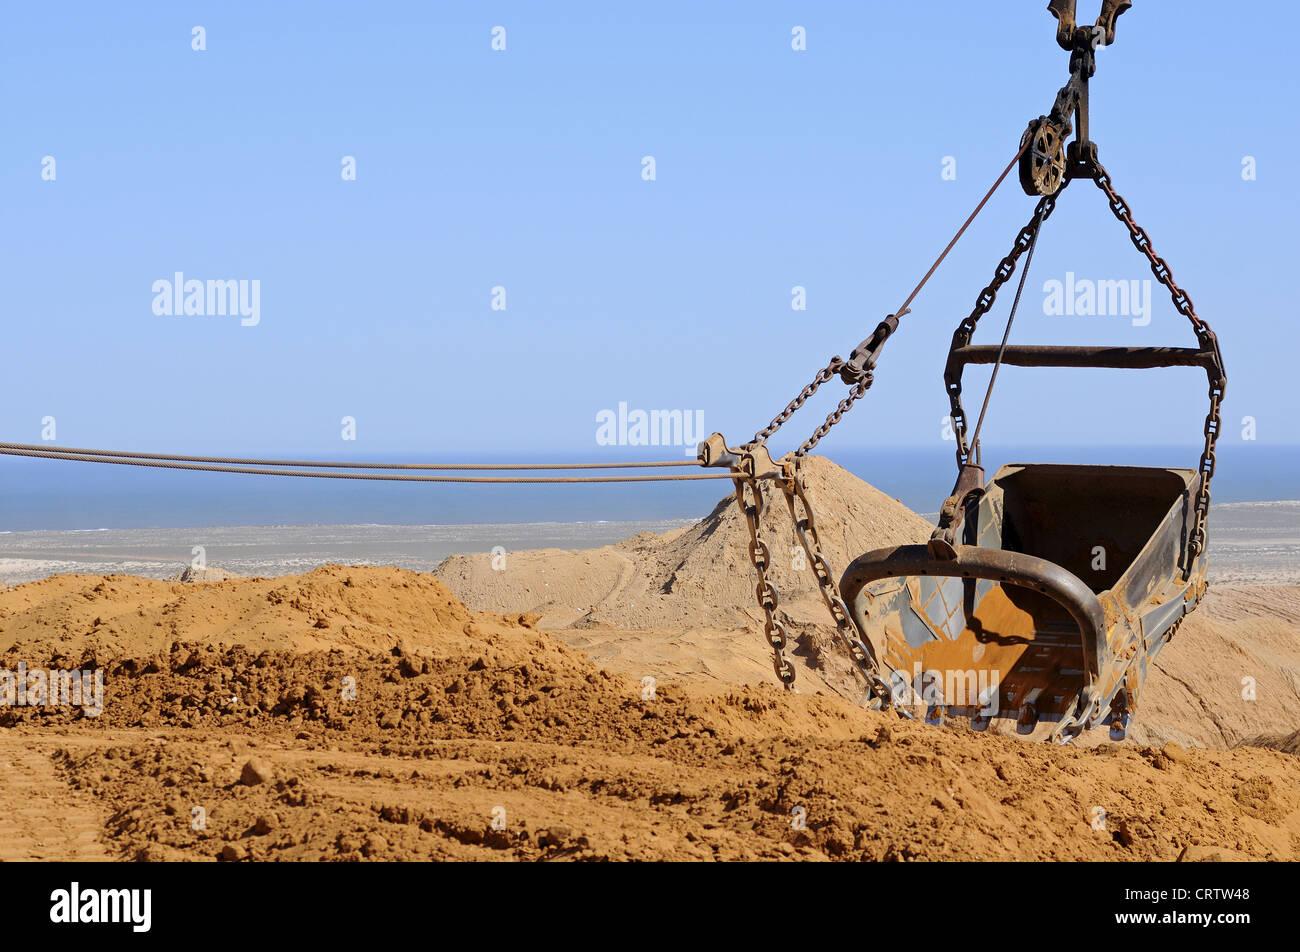 dragline excavator dumping excavated material Stock Photo